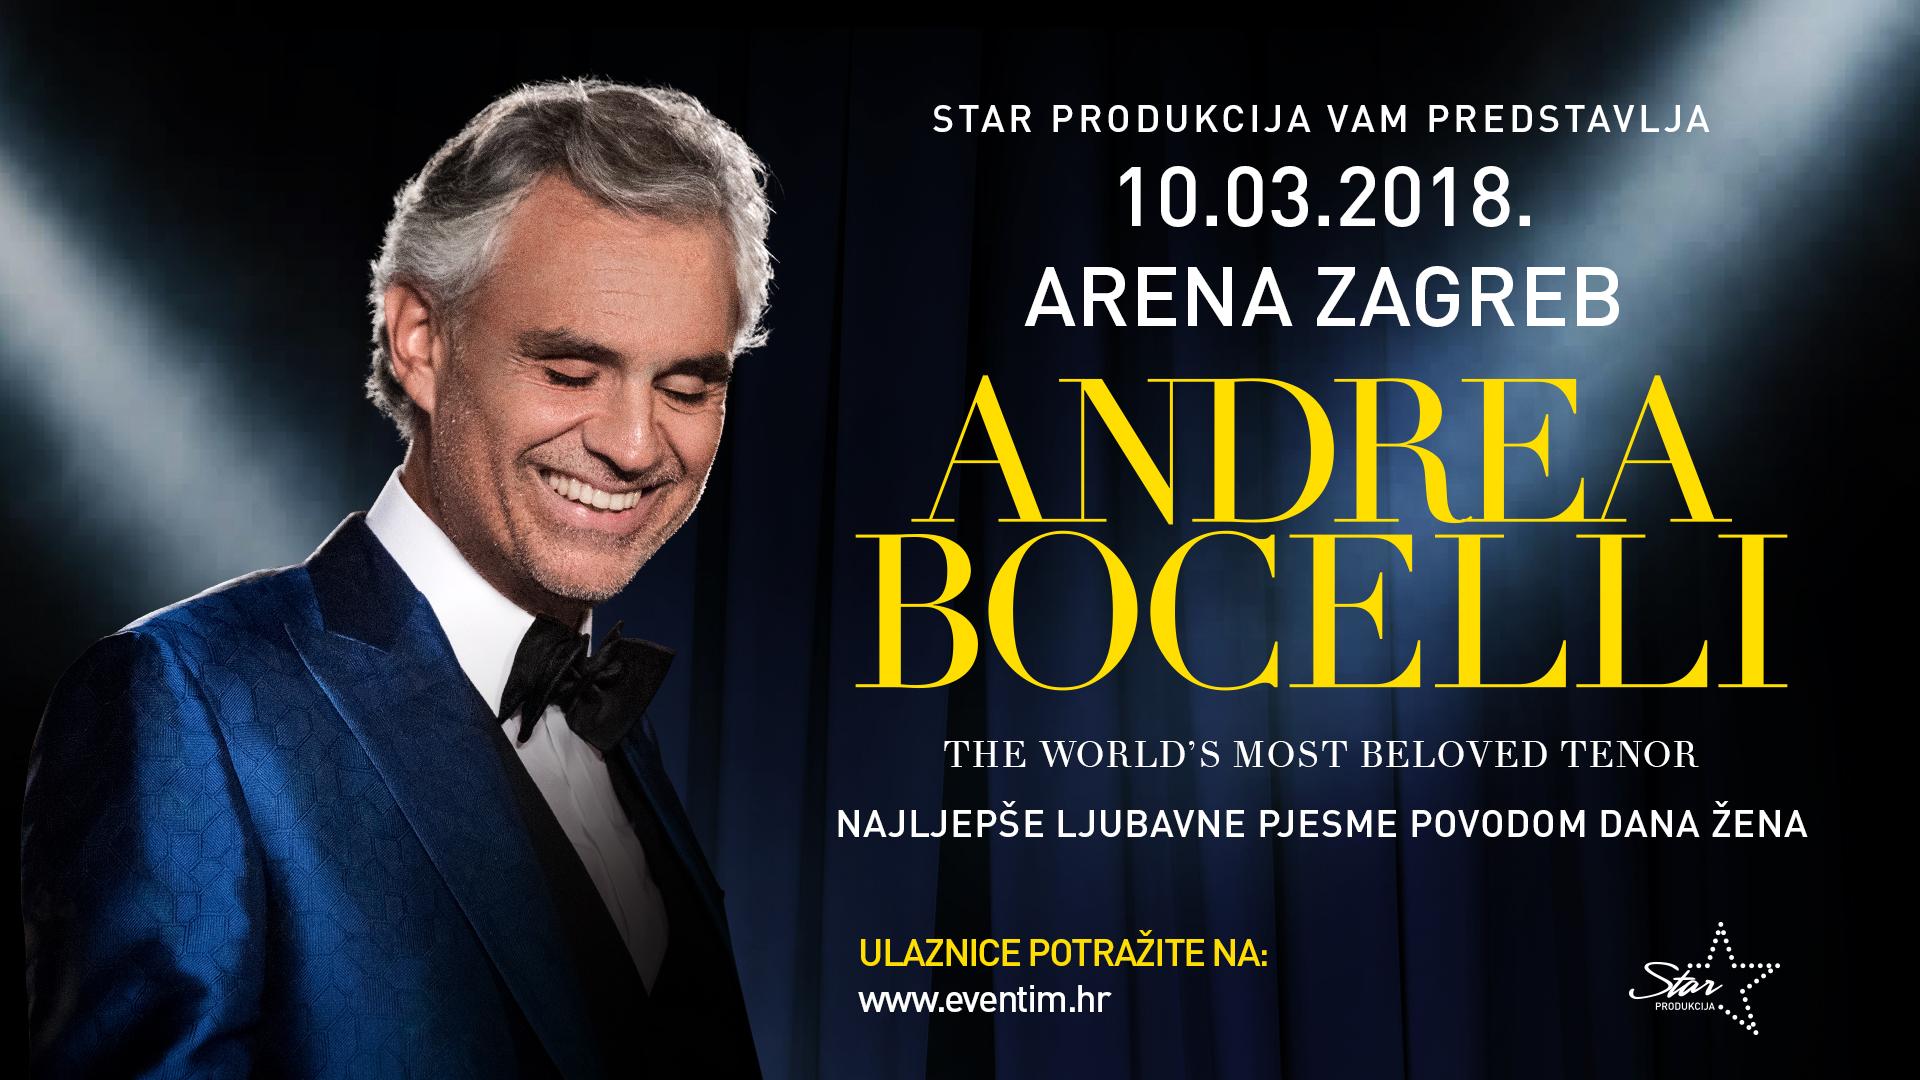 A LEGEND OF BEAUTY Andrea Bocelli bio poseban gost glazbeno-plesnog spektakla na ledu